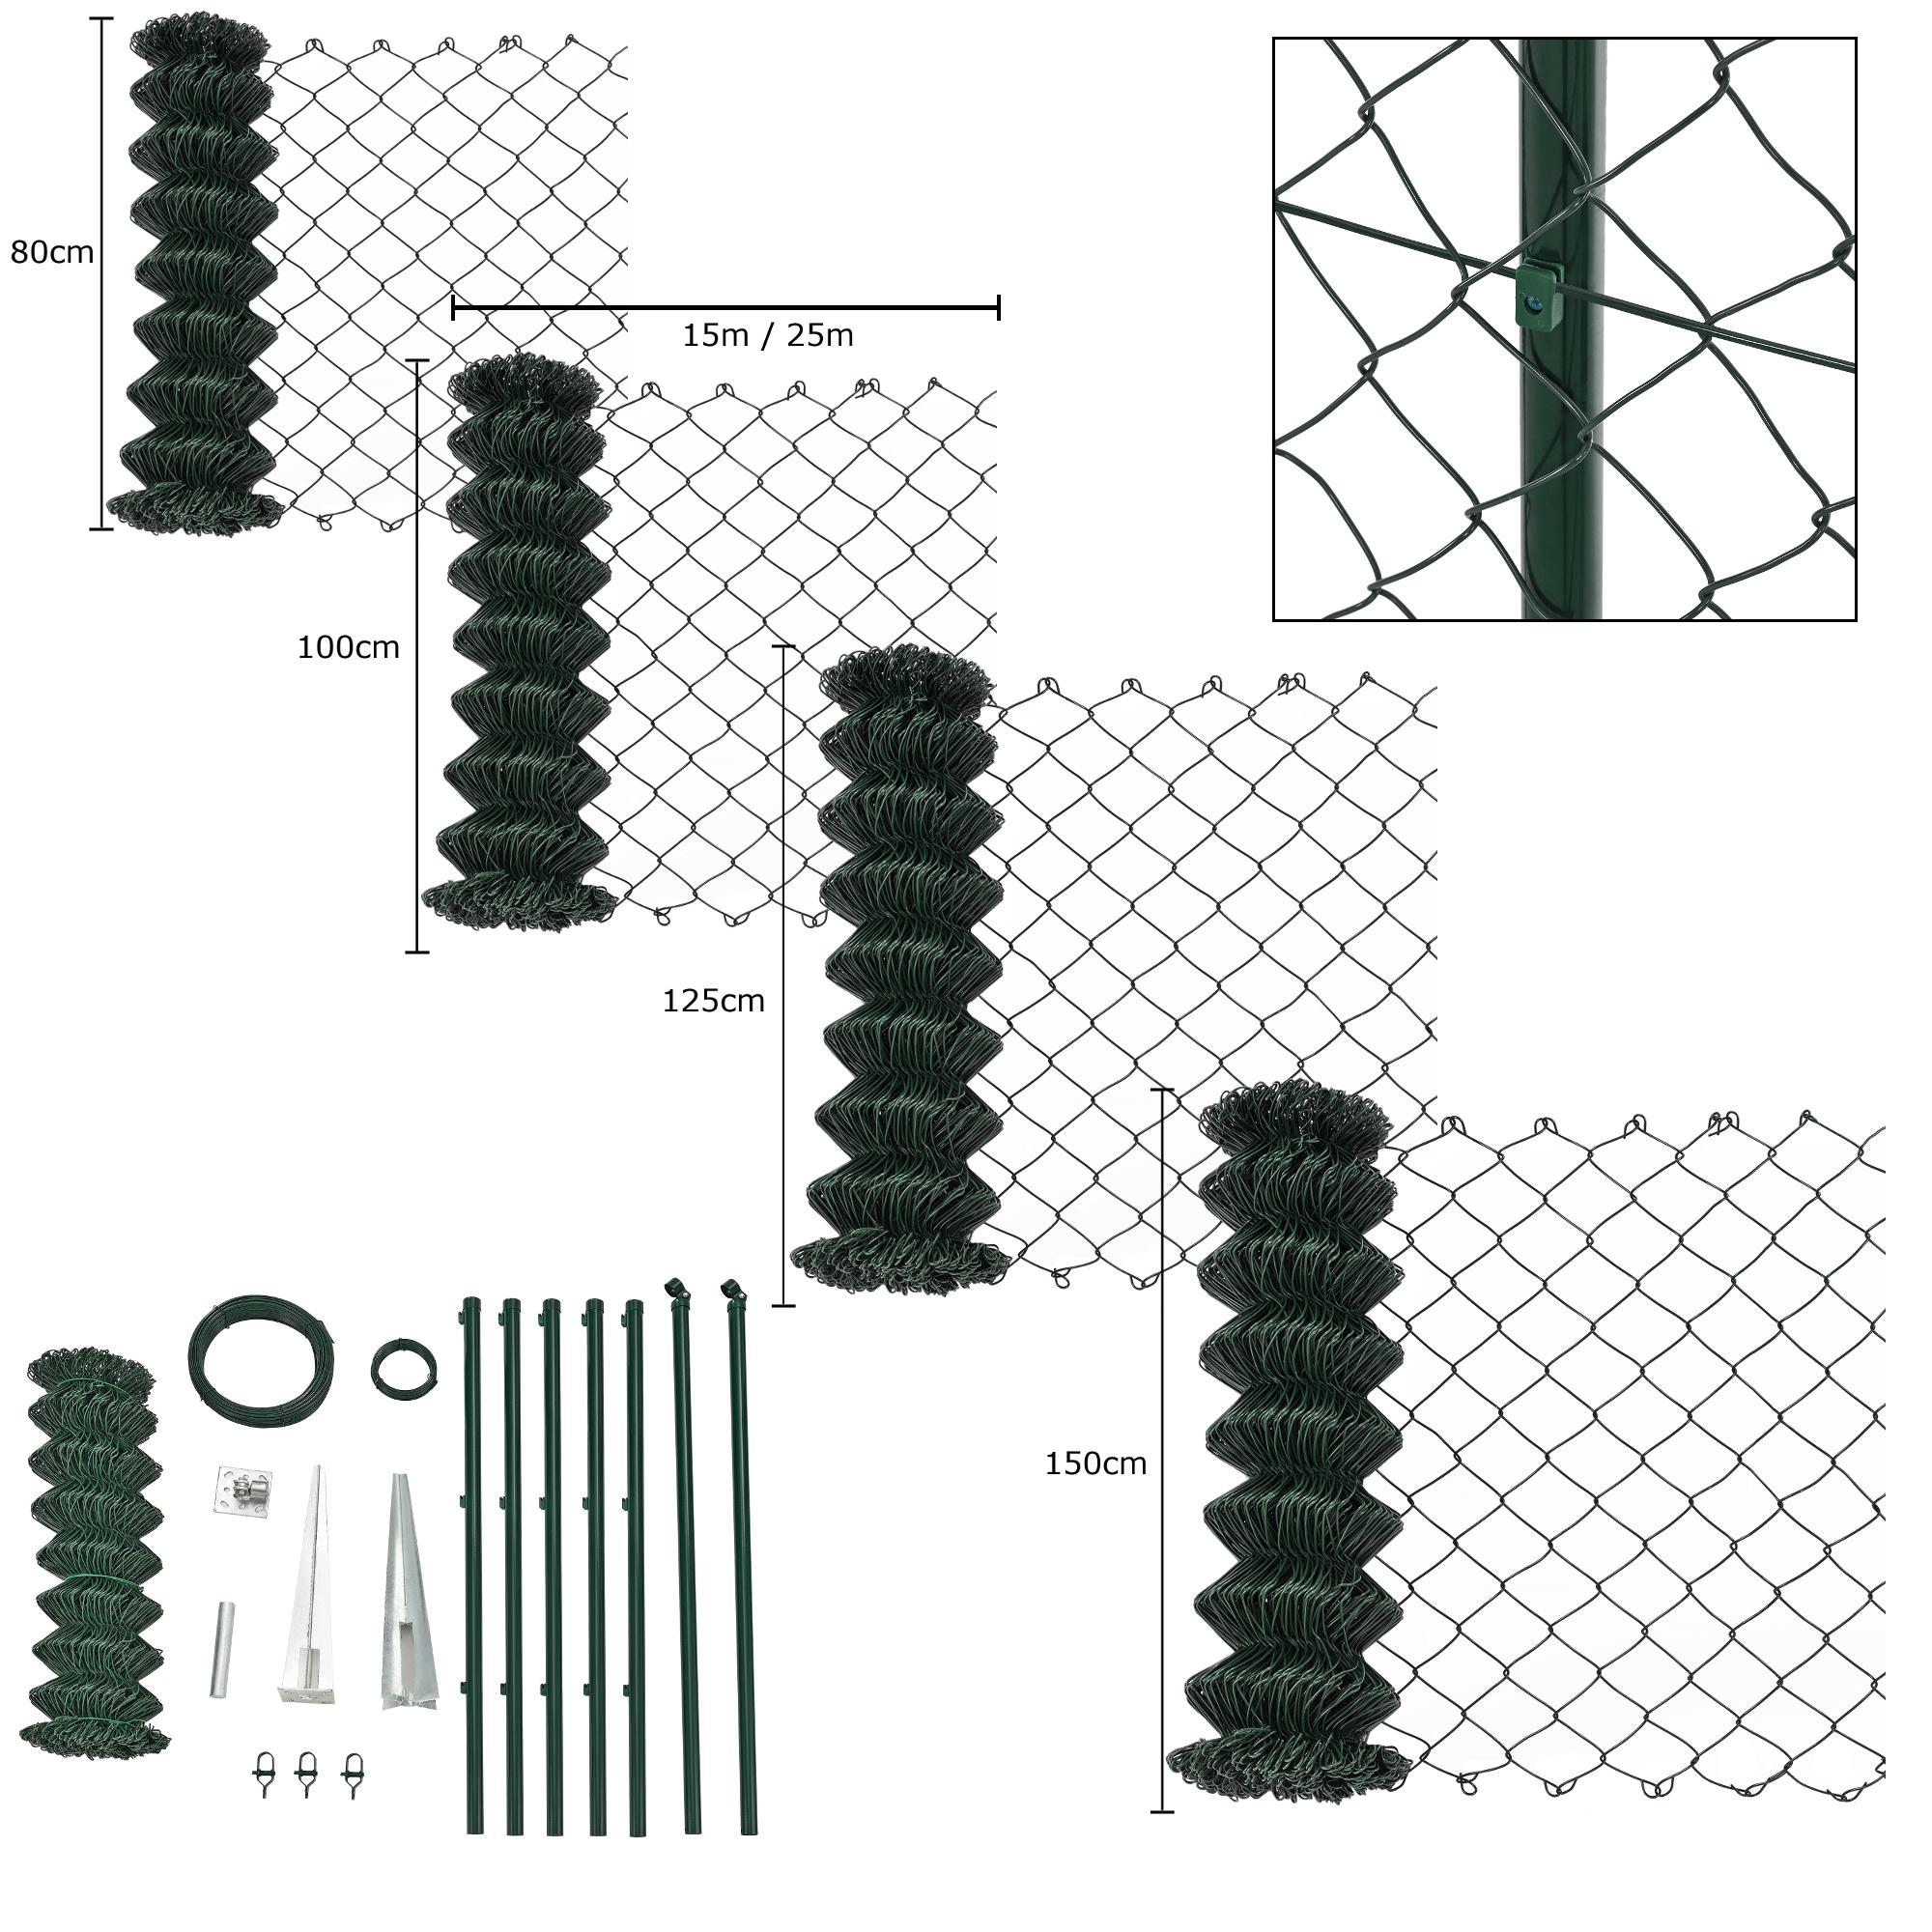 wire mesh fence complete set wire mesh garden. Black Bedroom Furniture Sets. Home Design Ideas